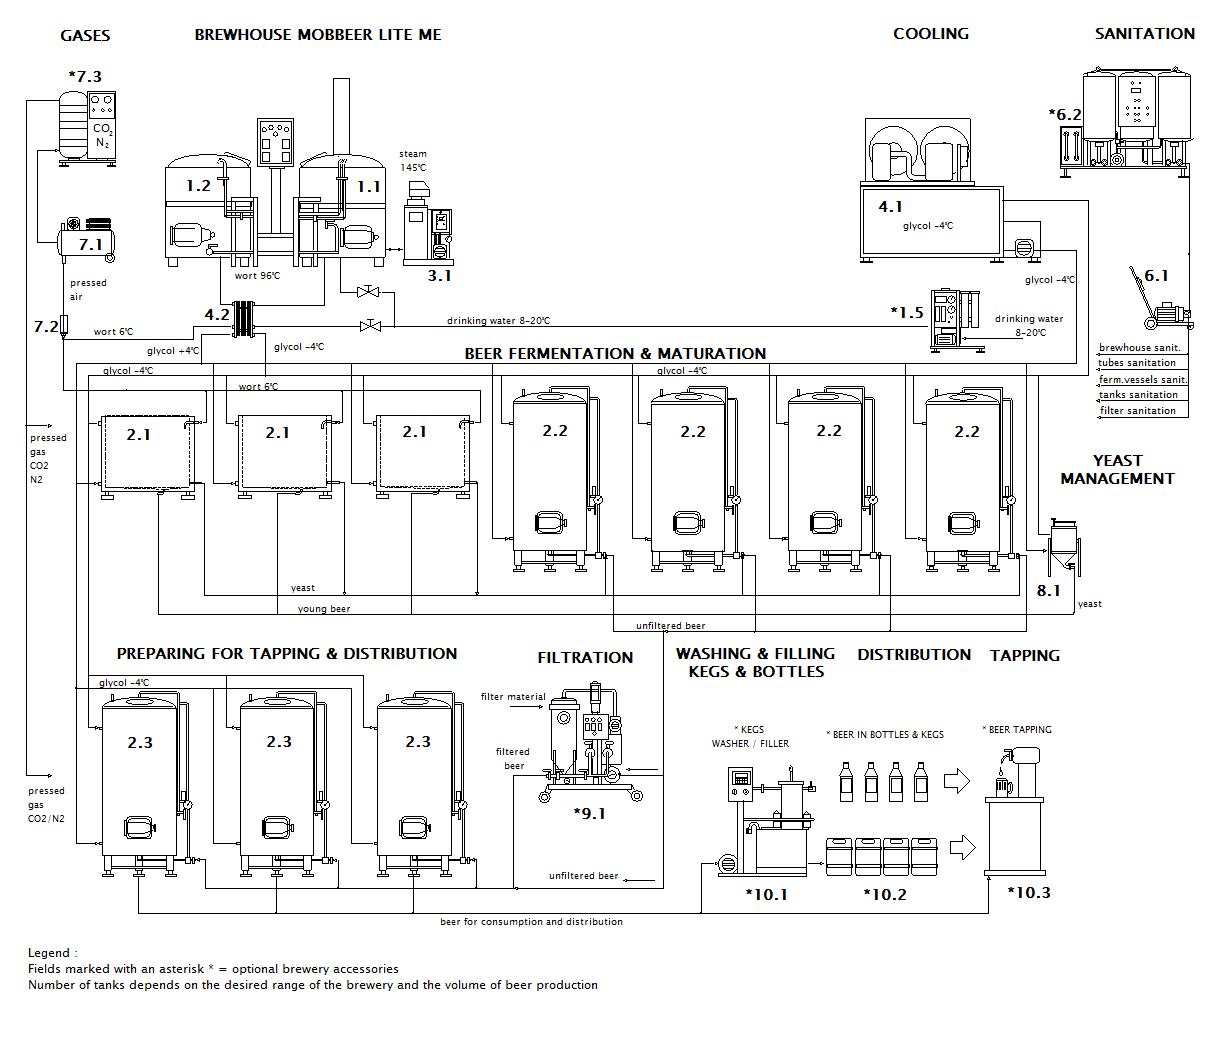 scheme-mbr-liteme-of-001-en